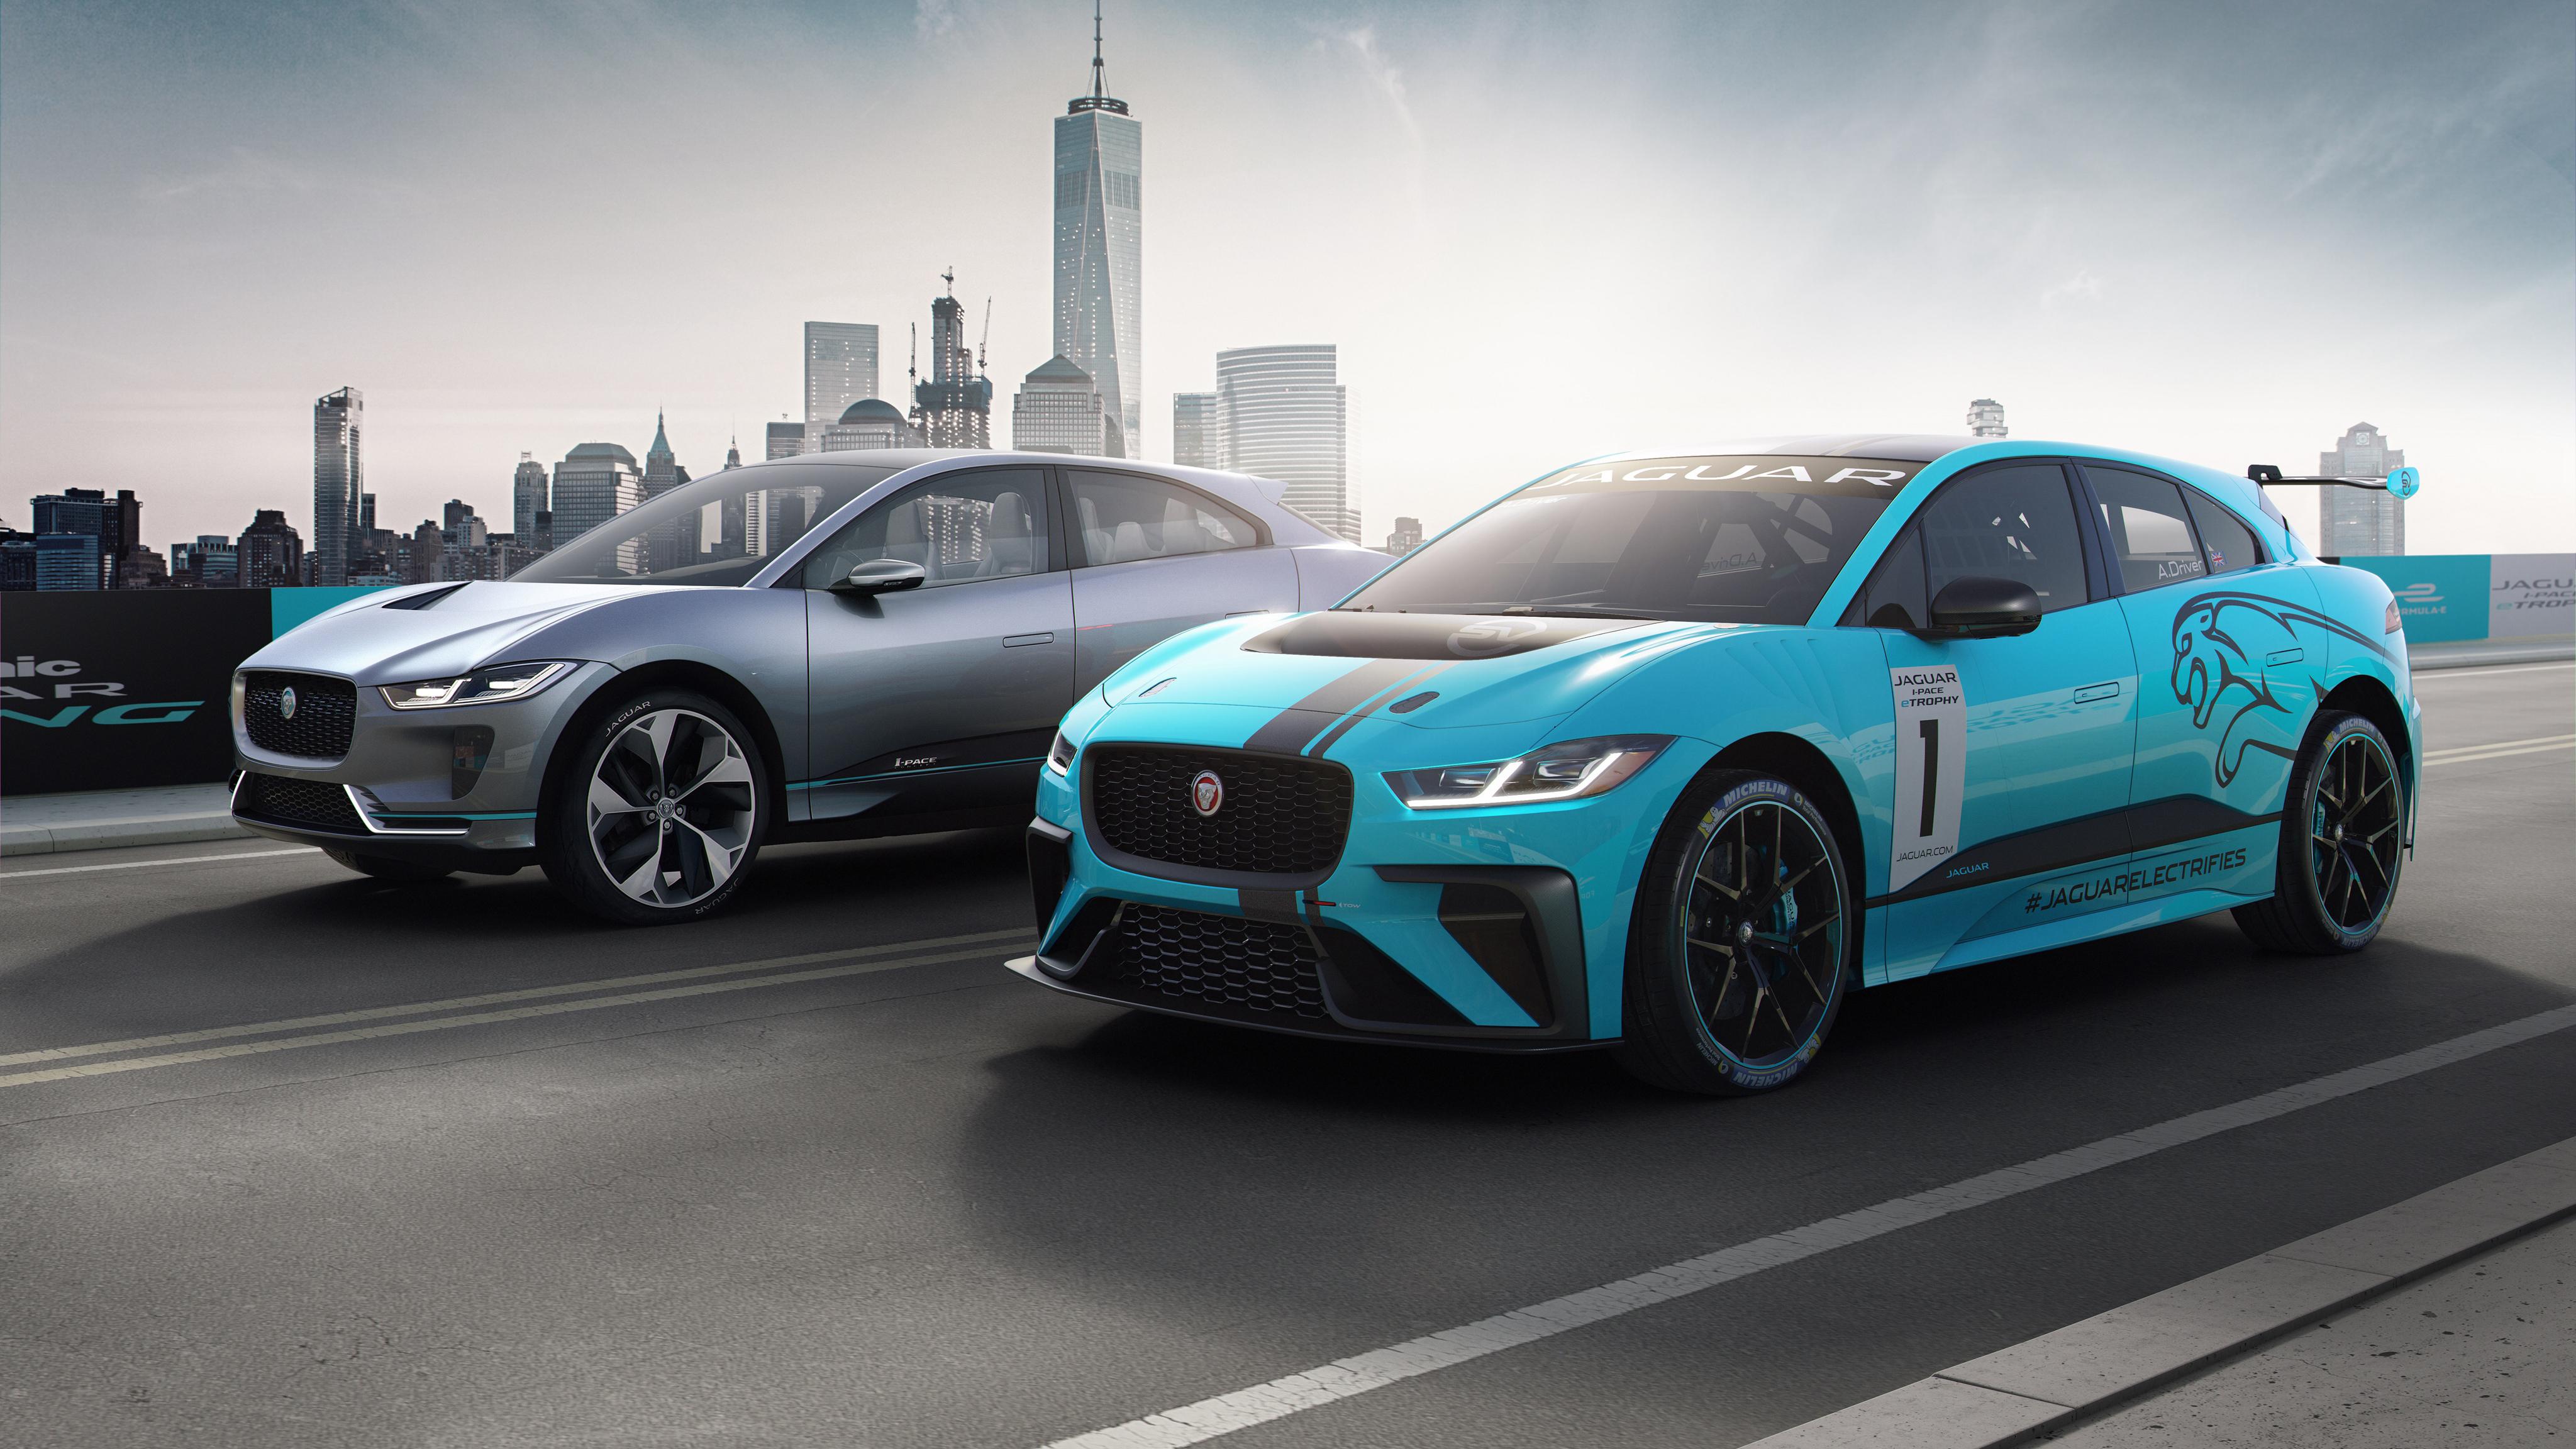 Iphone X Dynamic Wallpaper Android Jaguar I Pace Concept 4k Wallpaper Hd Car Wallpapers